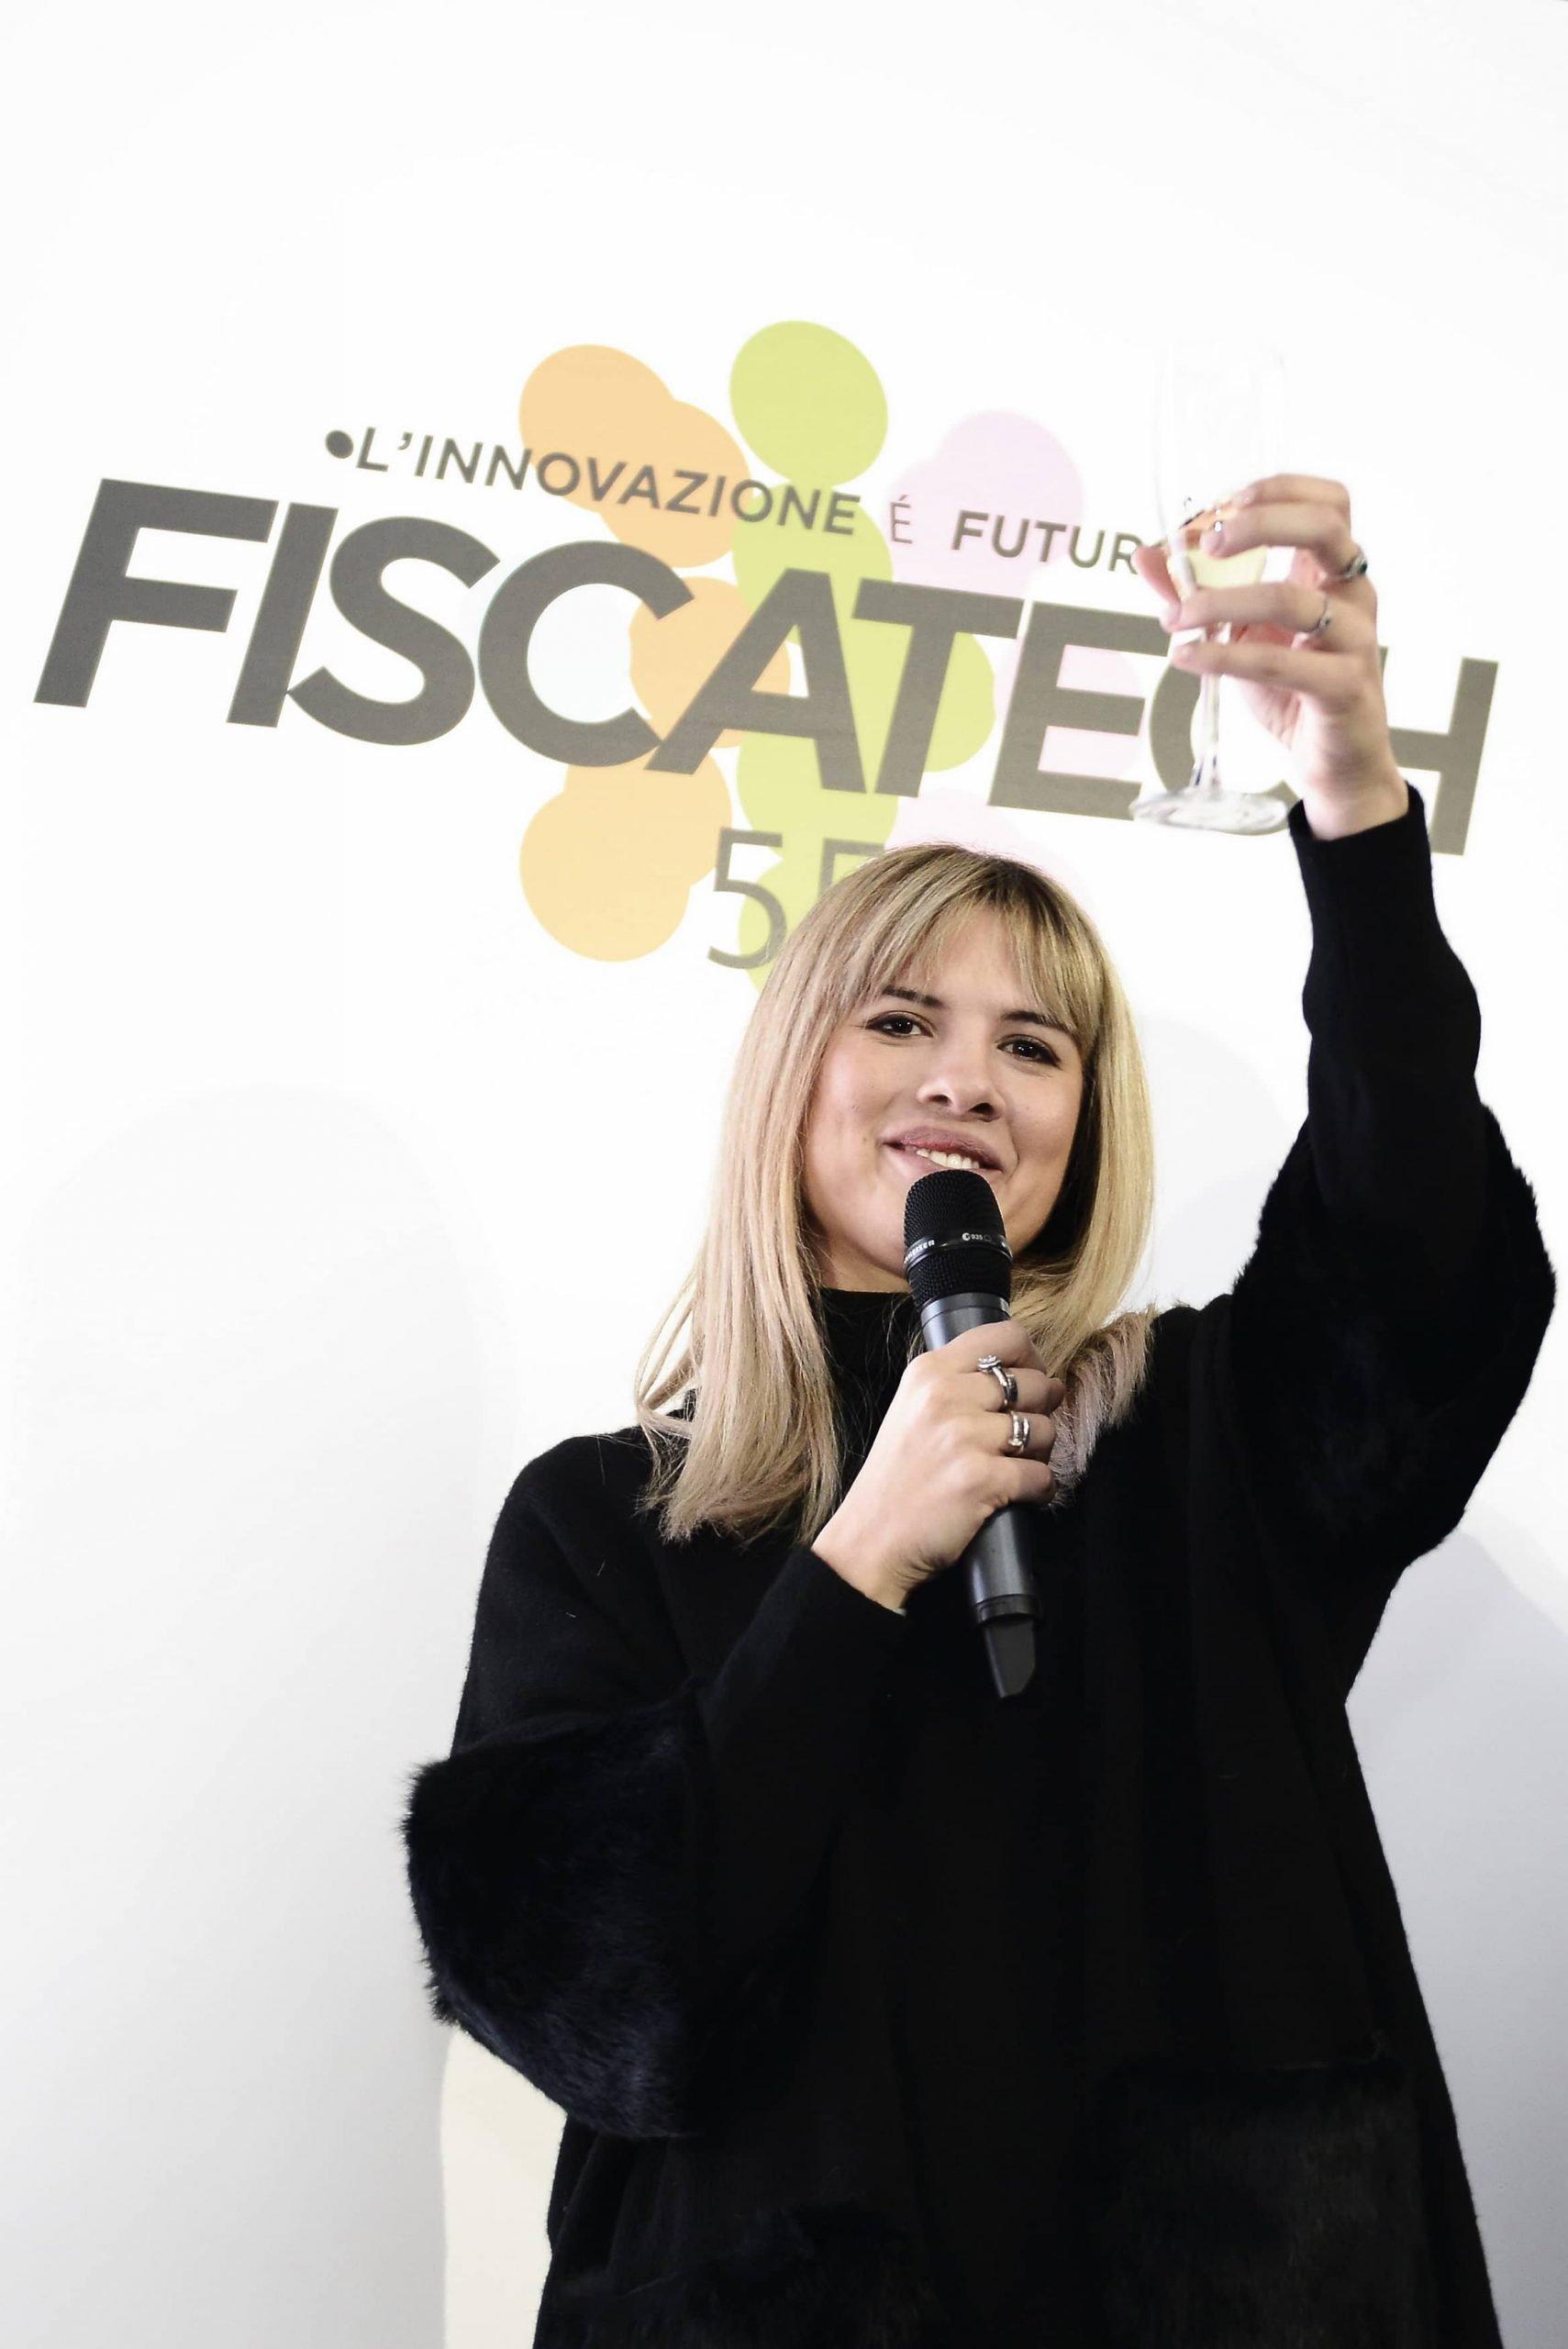 fiscatech-55-foto-7